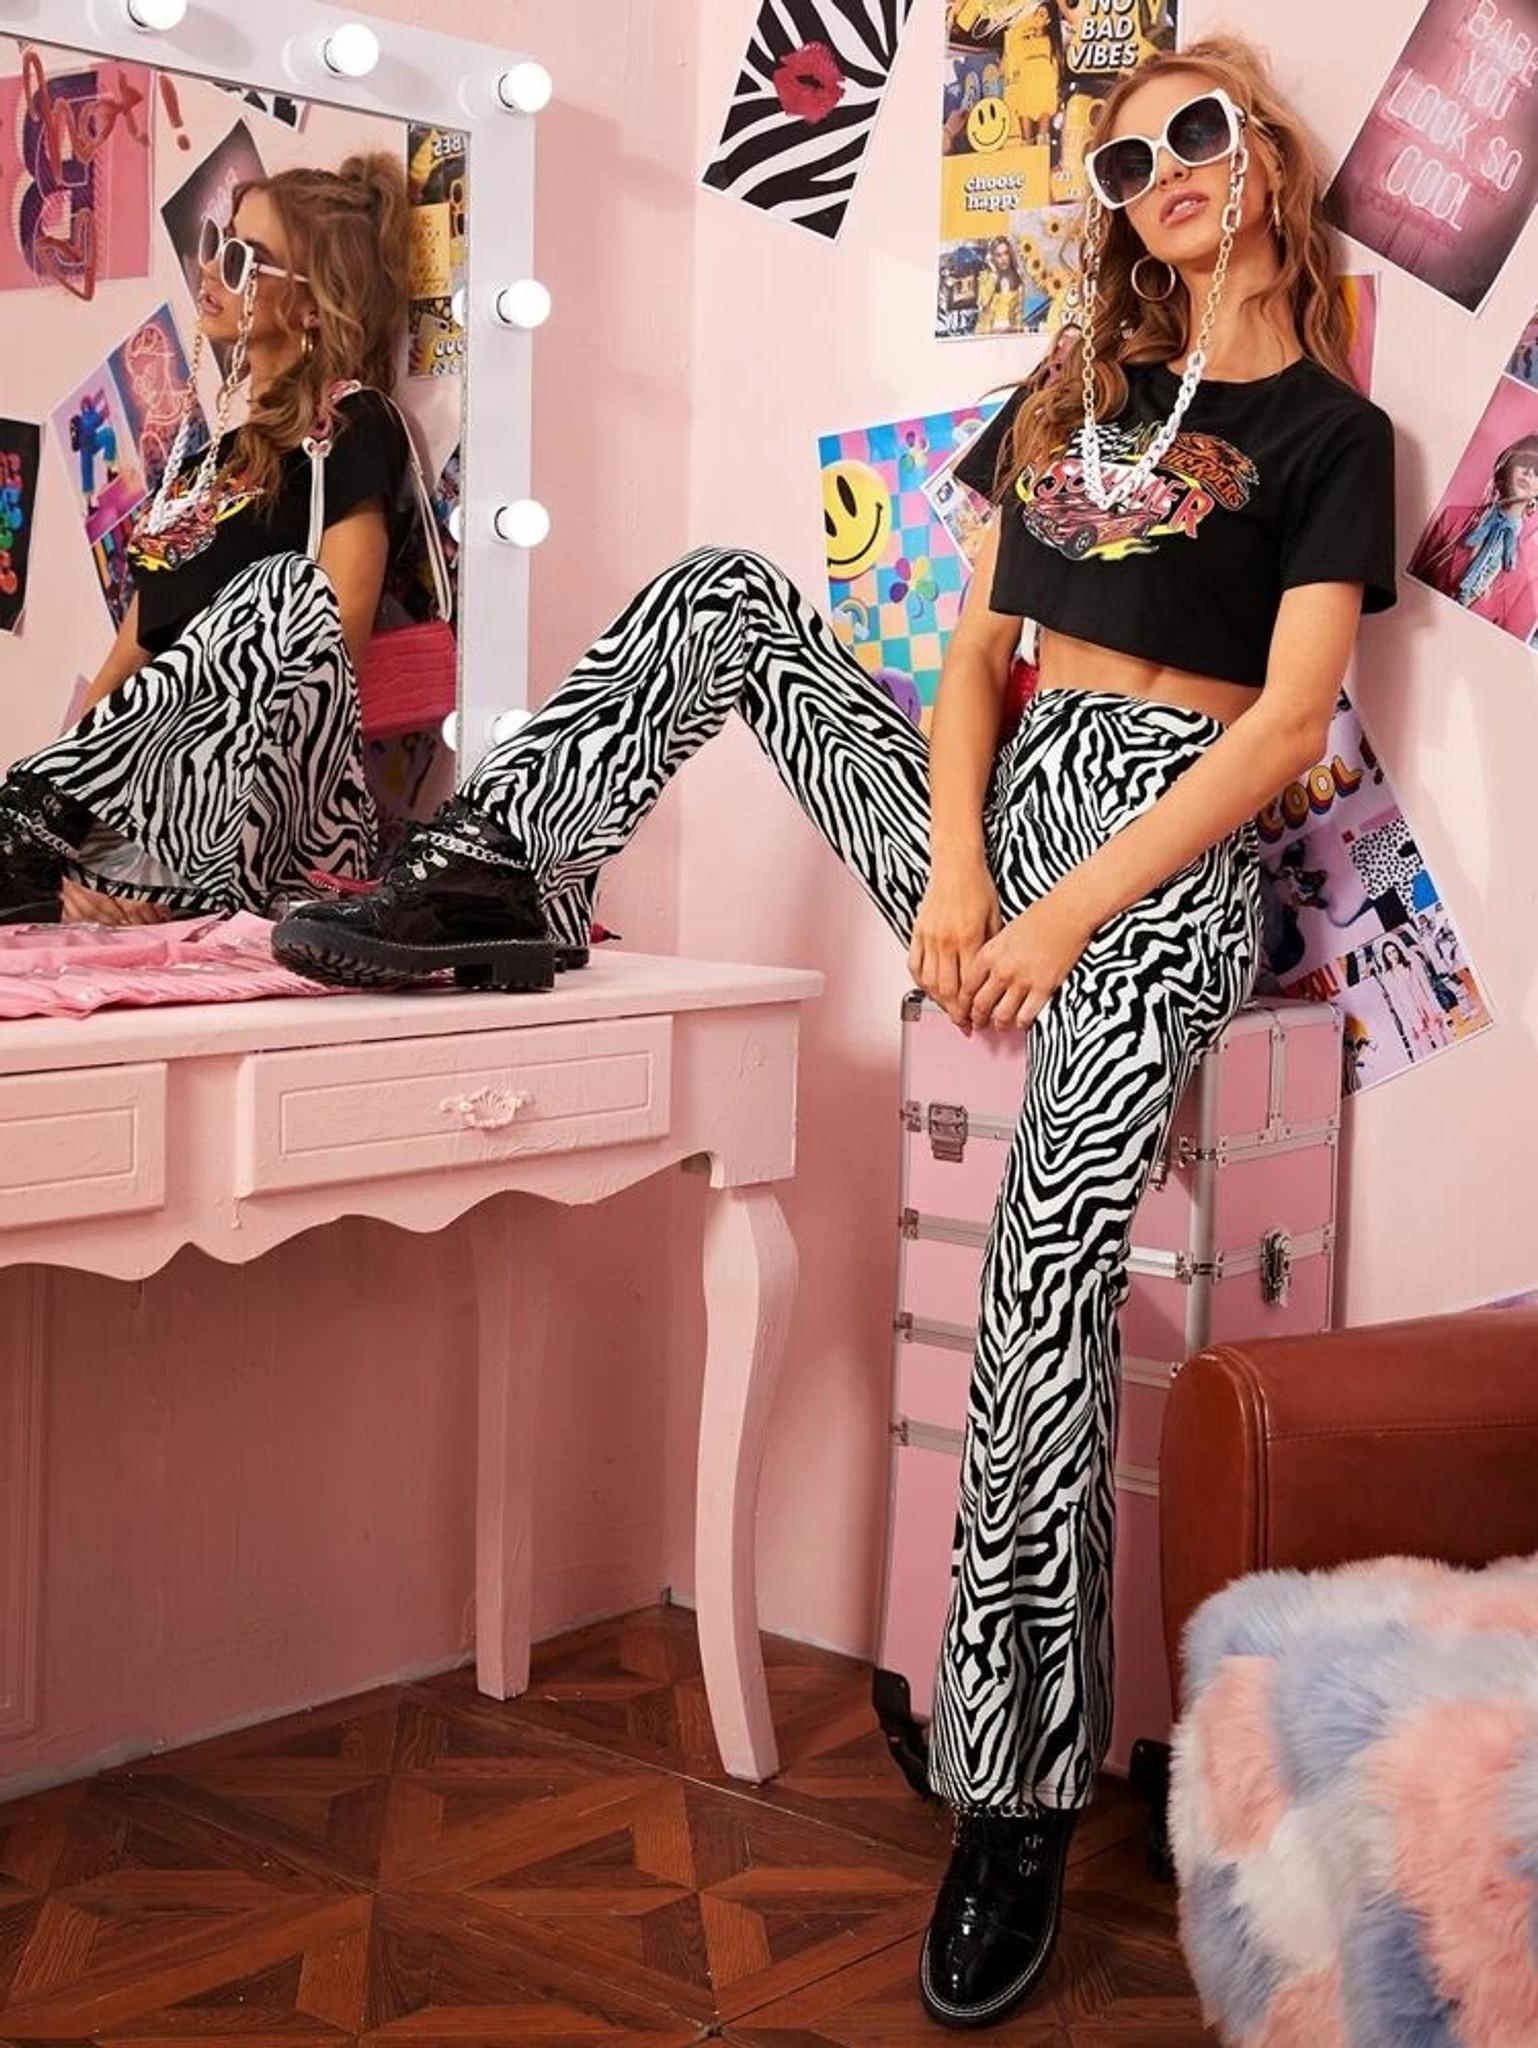 Fifth Avenue Georgette GTTWP30 Zebra Print Flared Pants